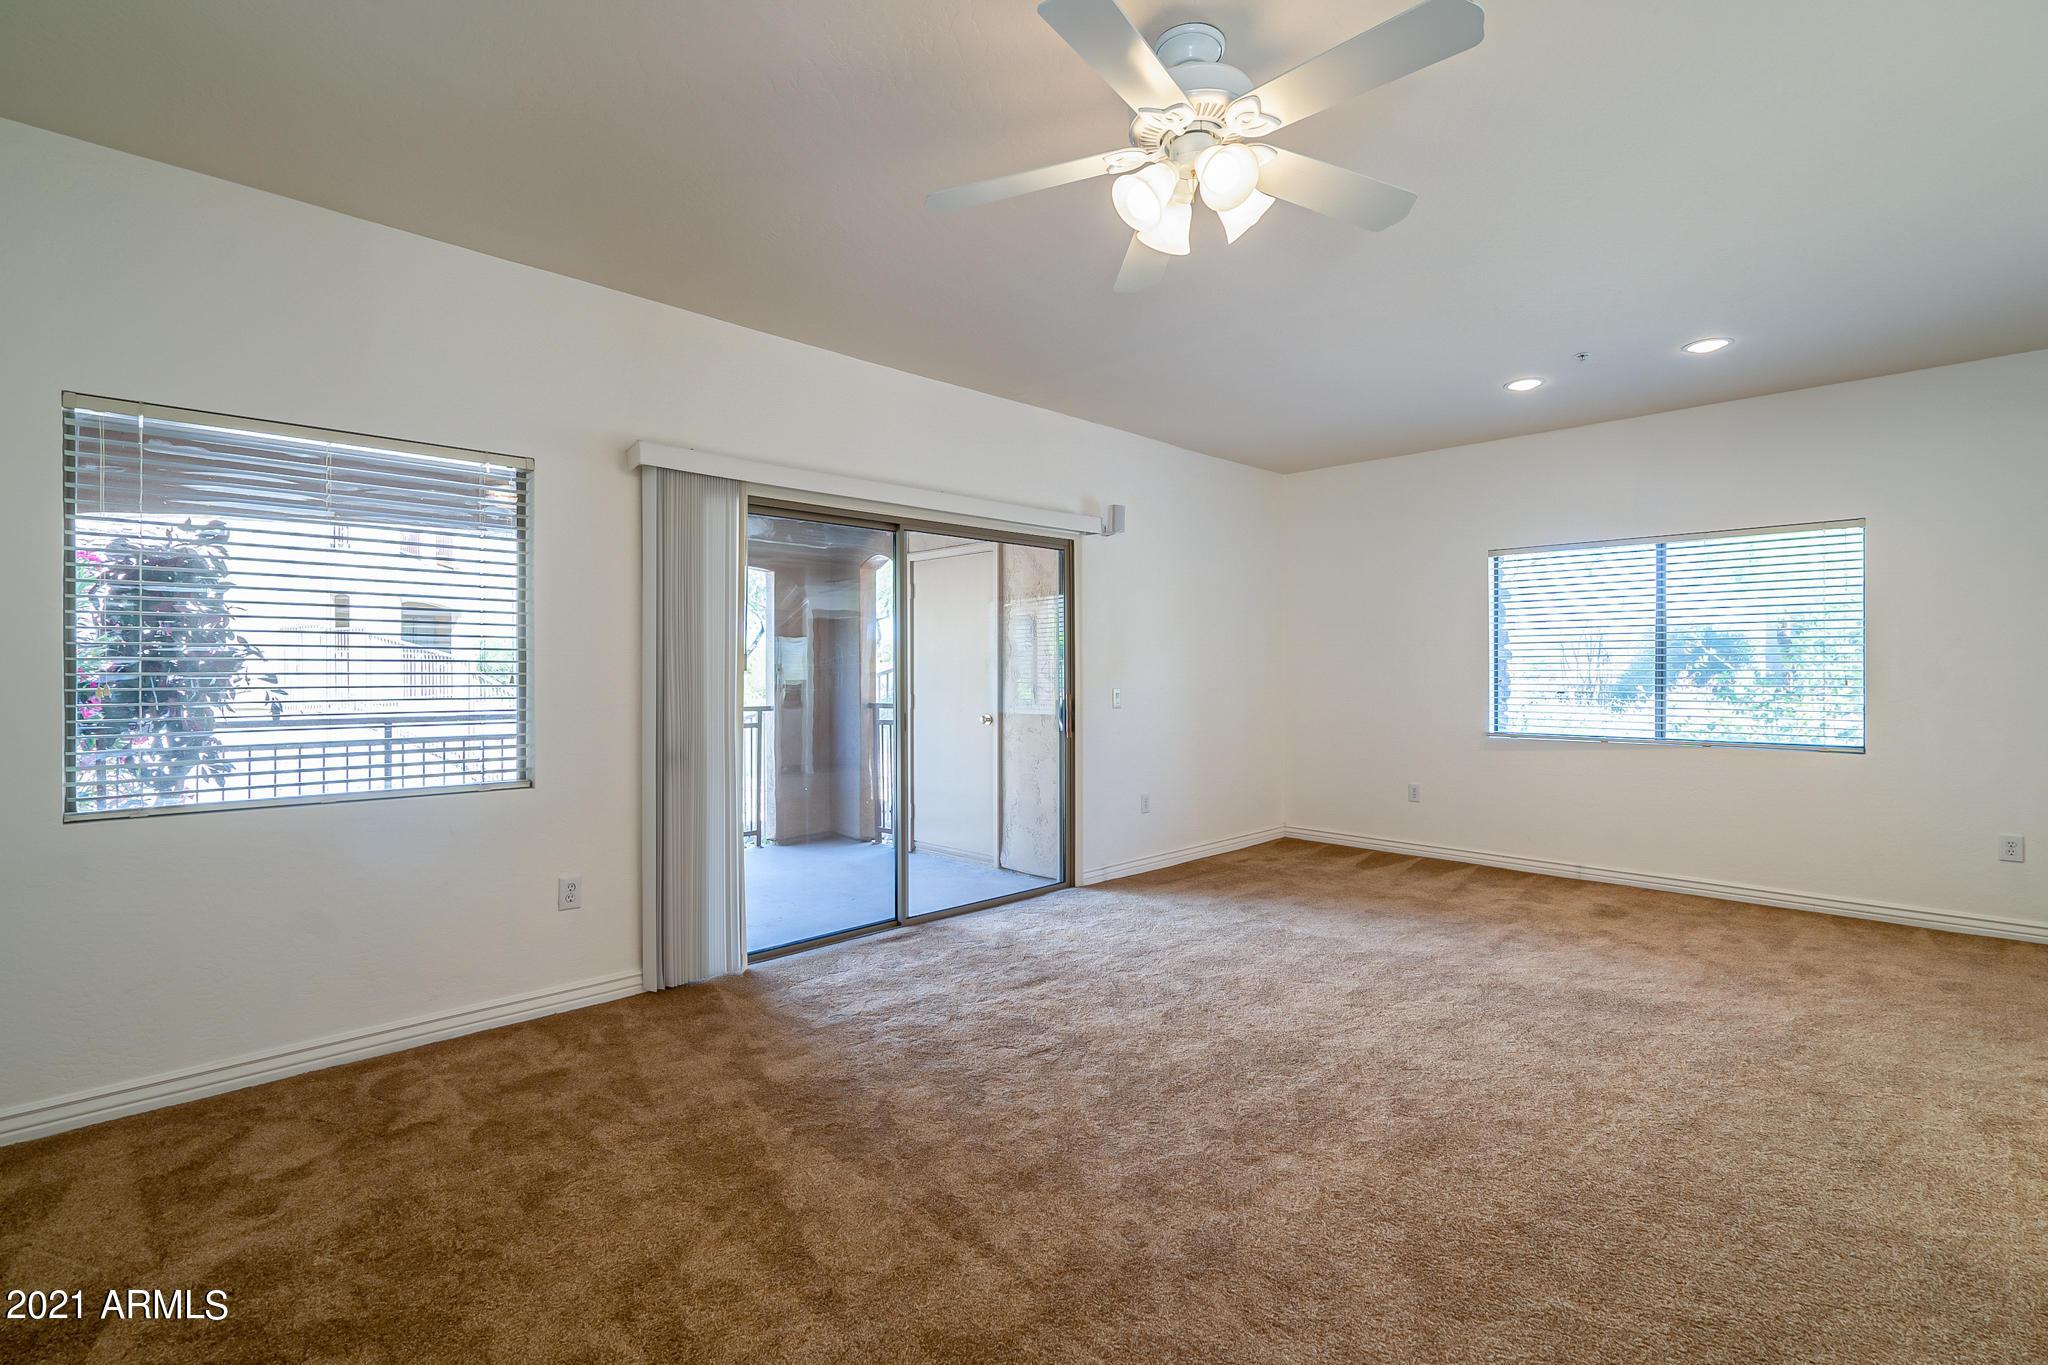 16801 94TH Street, Scottsdale, Arizona 85260, 2 Bedrooms Bedrooms, ,1.75 BathroomsBathrooms,Residential Rental,For Rent,94TH,6223436